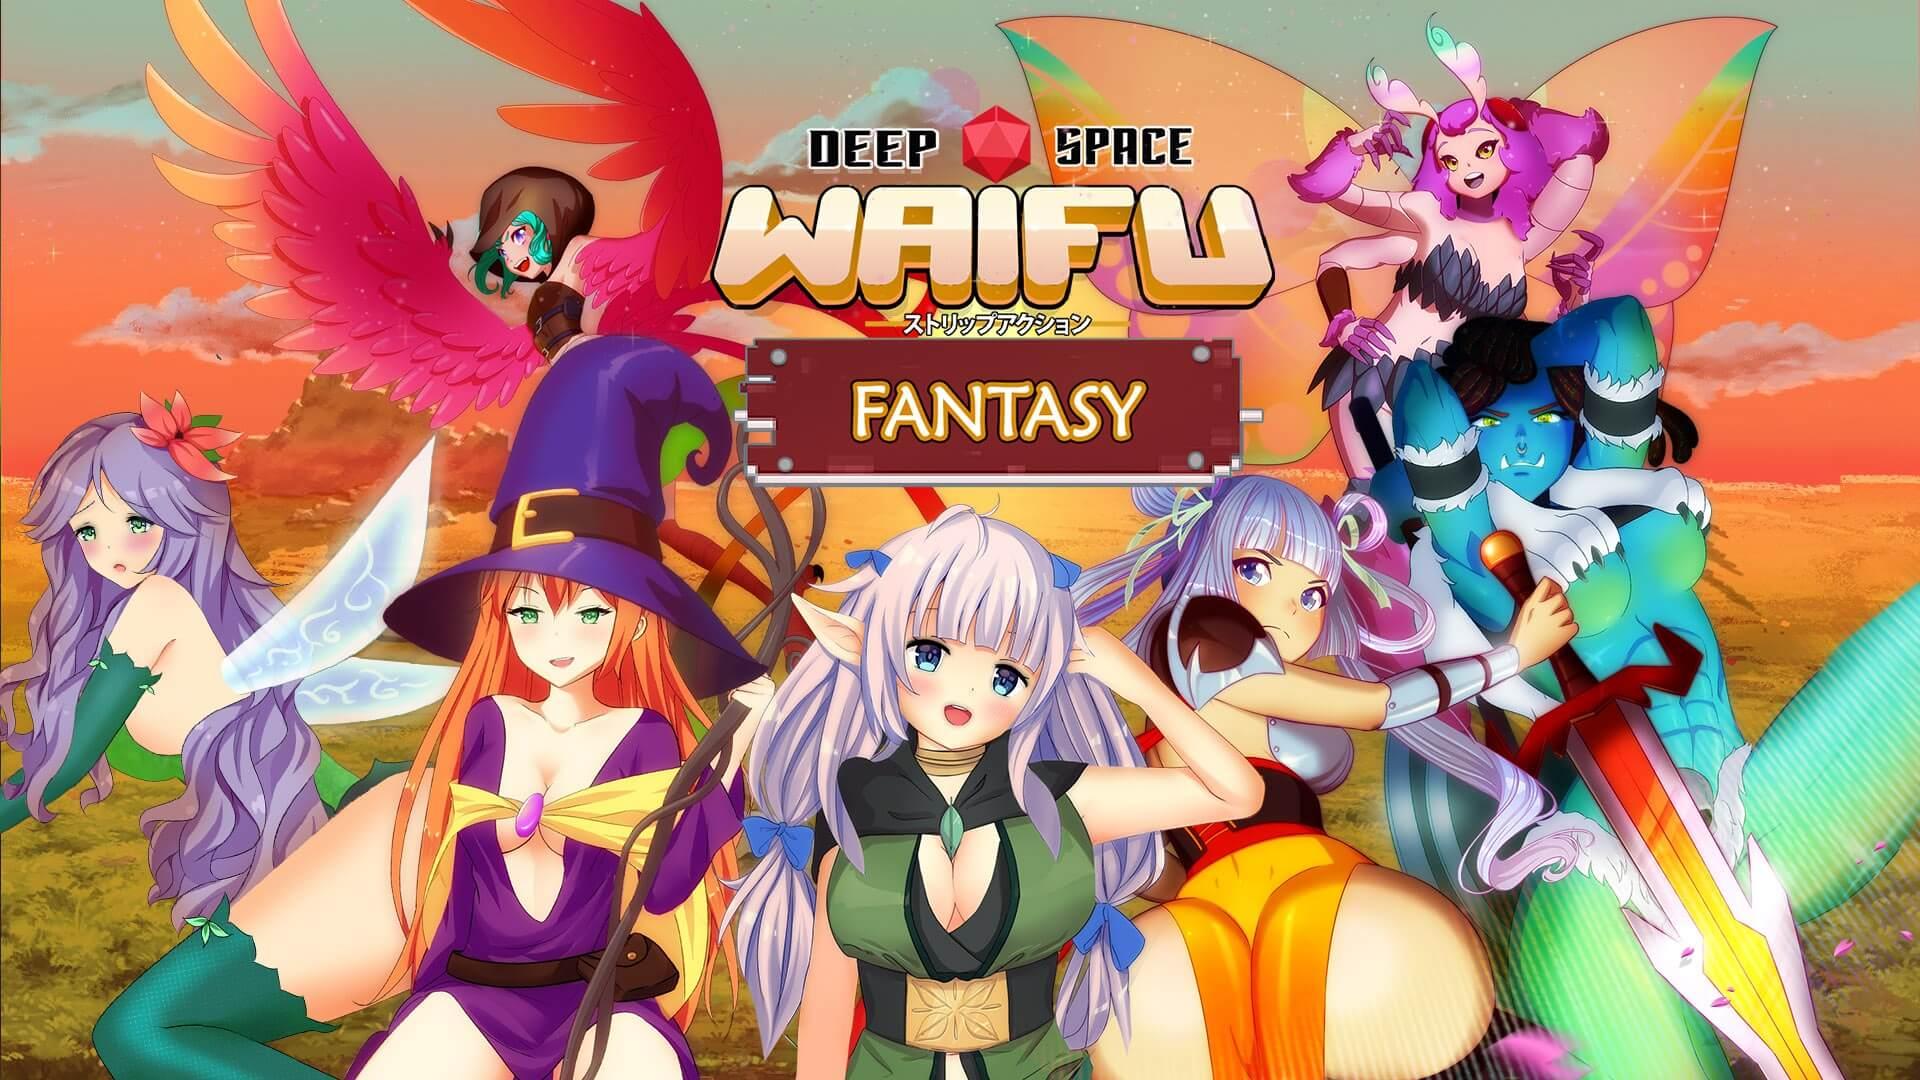 Deep Space Waifu download pc